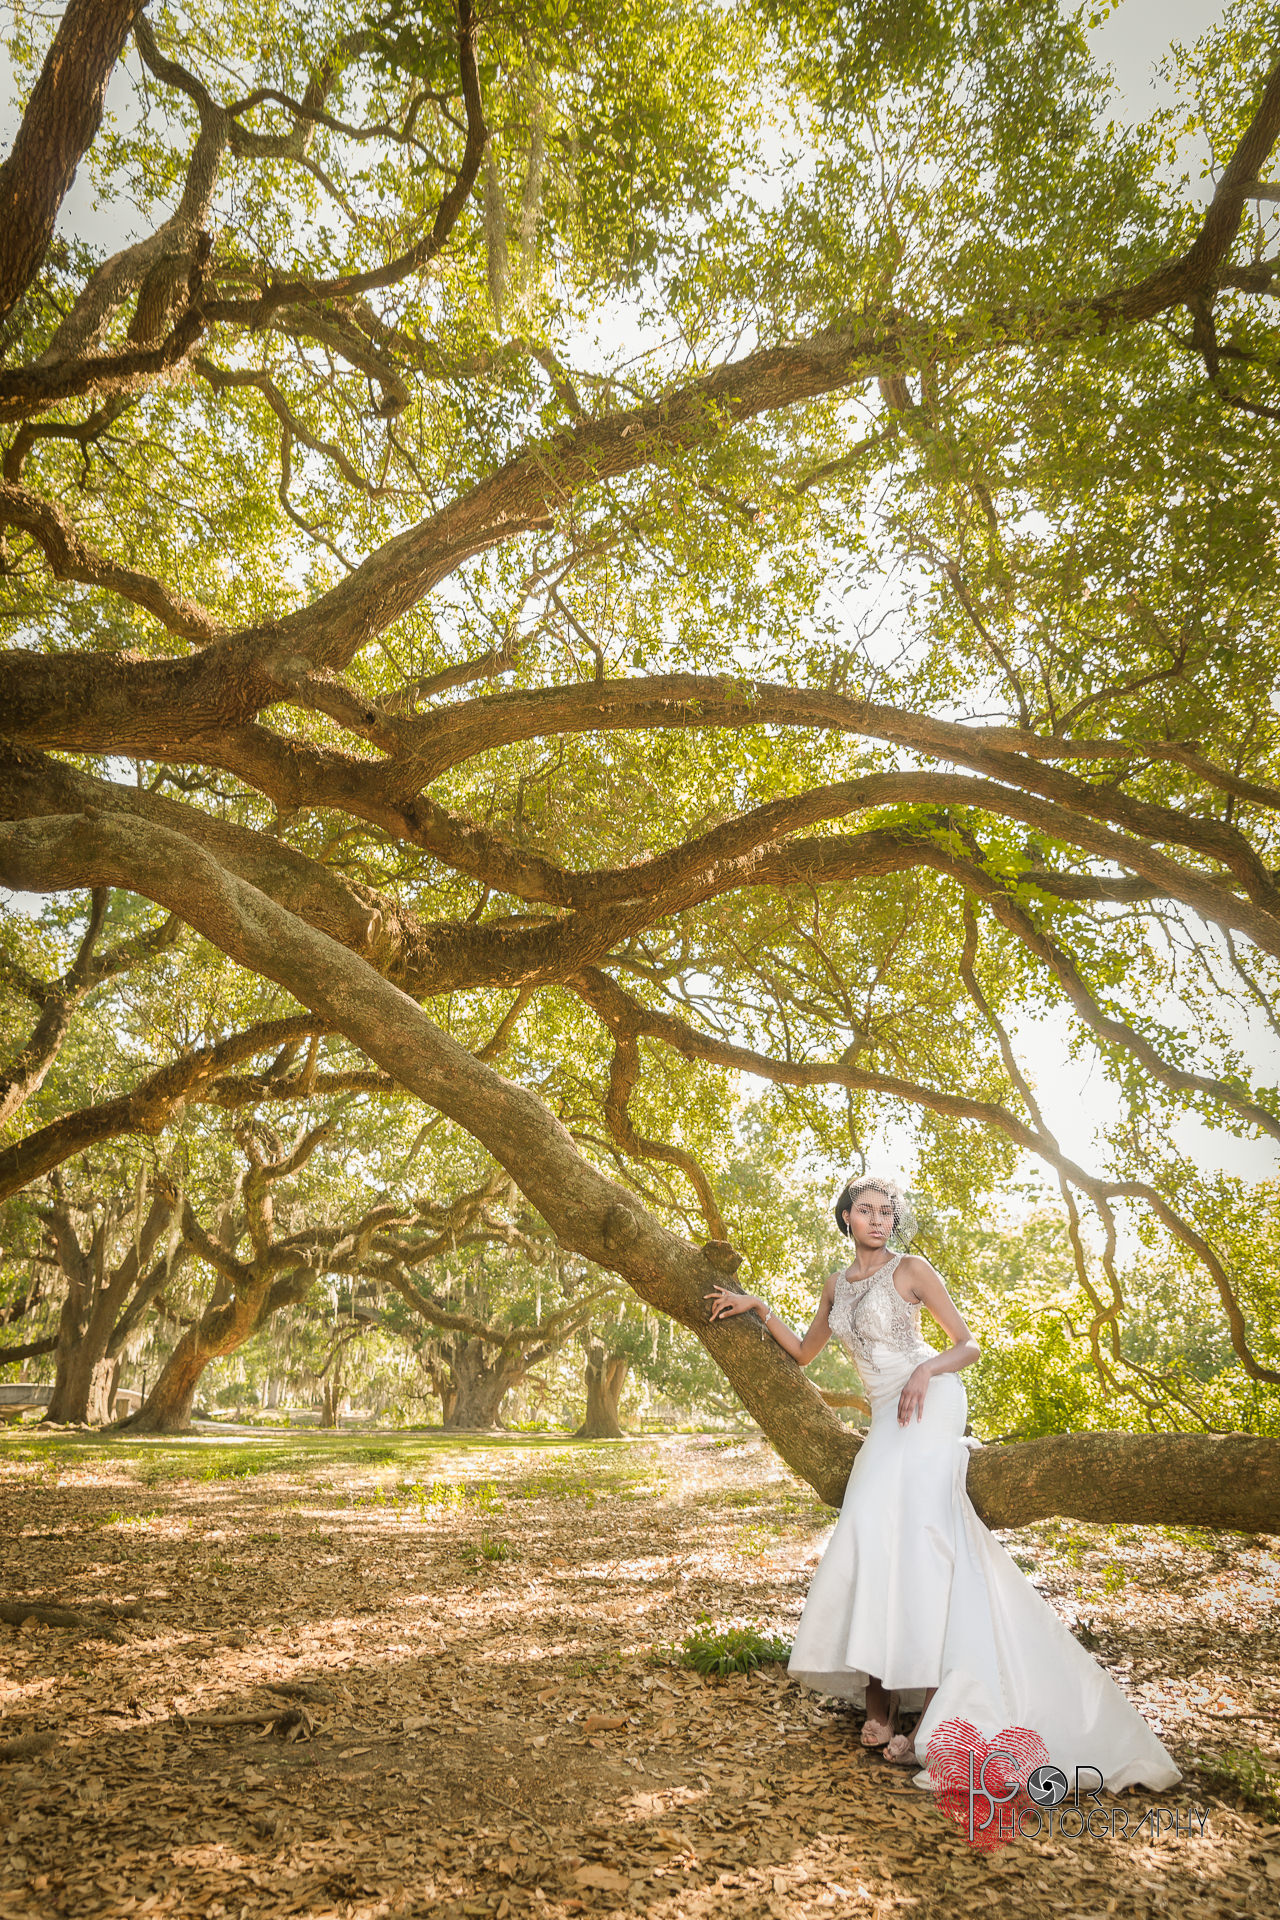 Lousiana Oak trees and bride